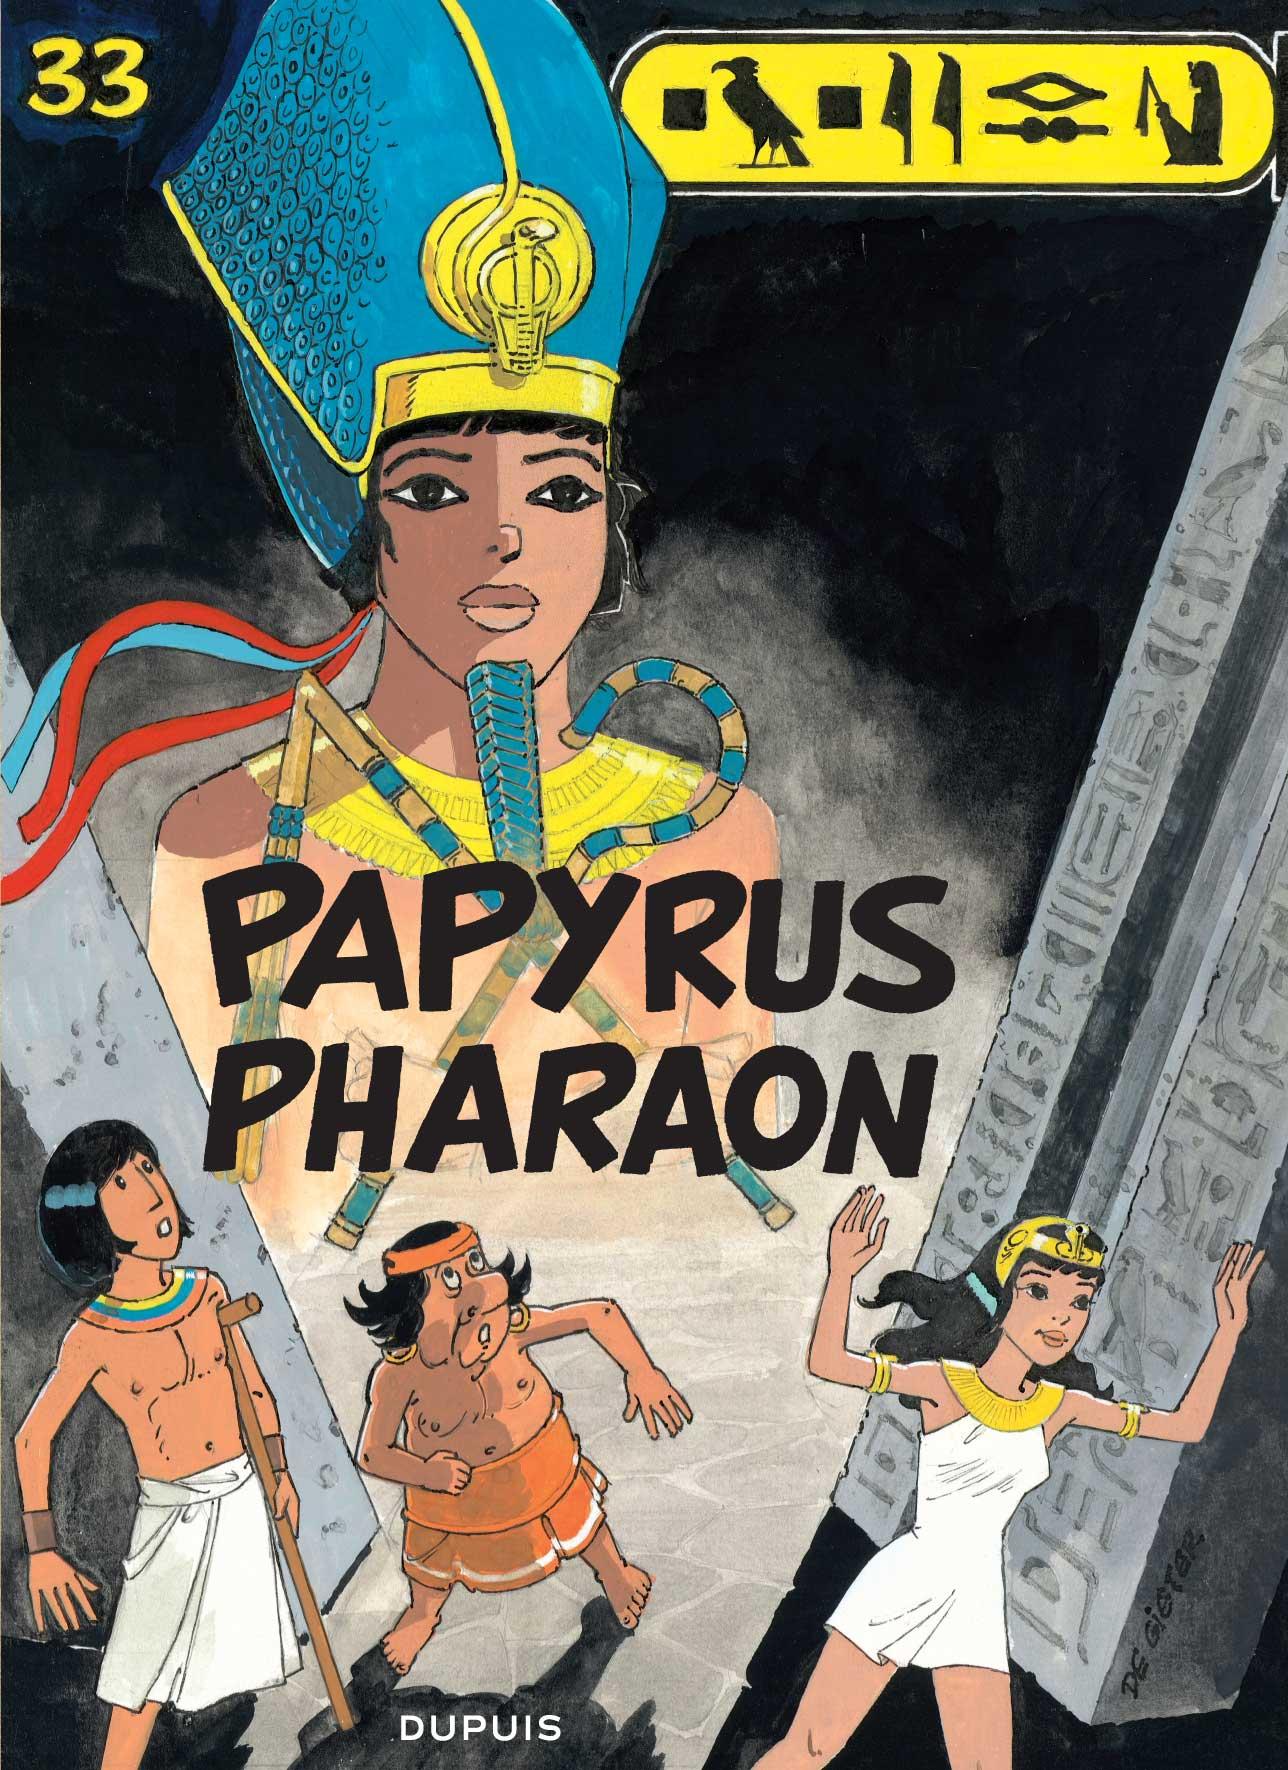 Couverture T 33 Papyrus pharaon